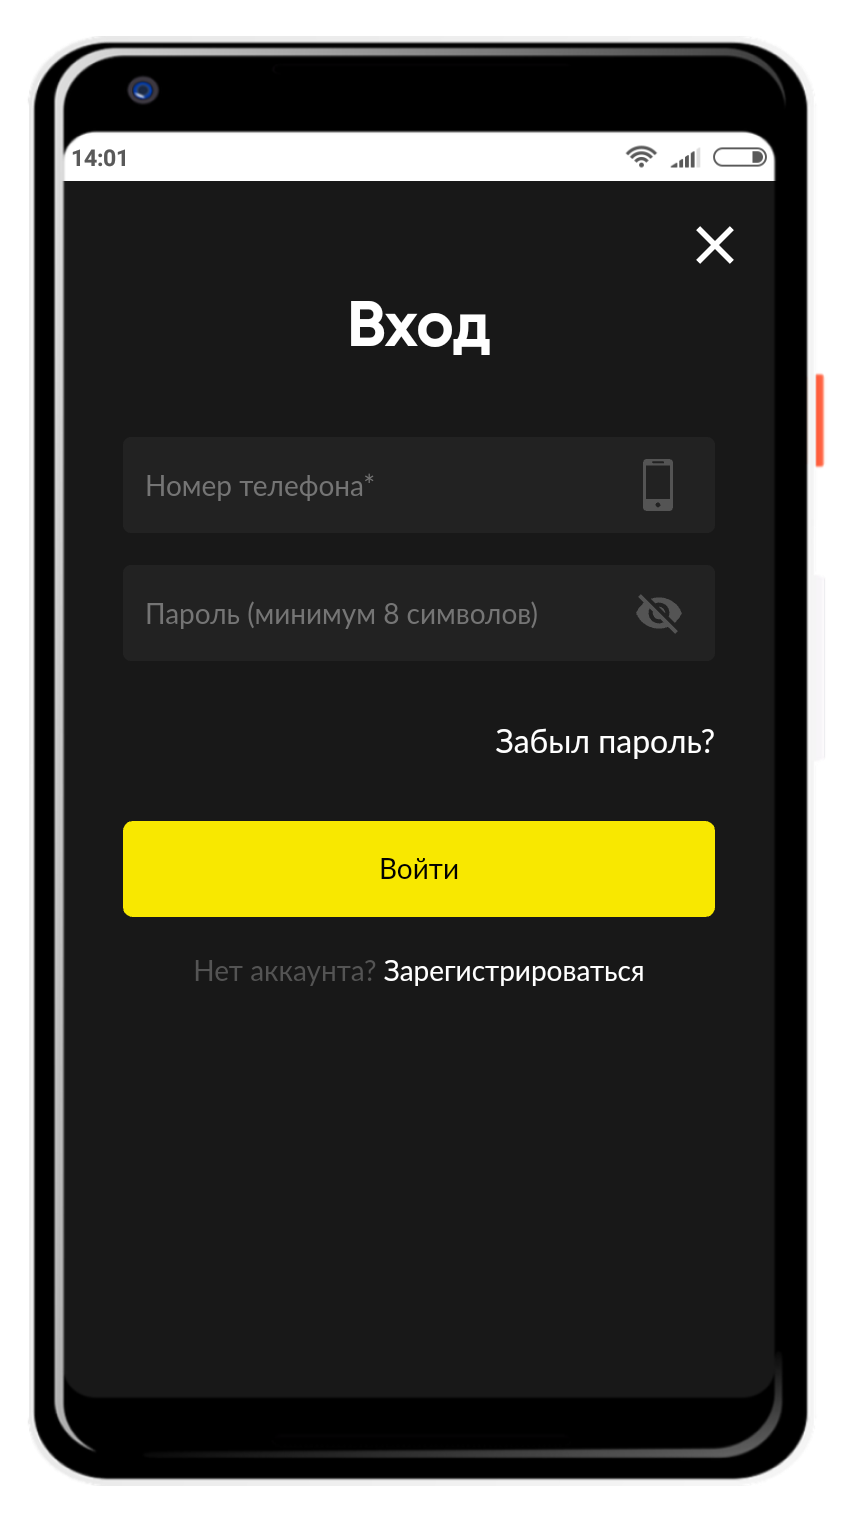 Вход через моб версию